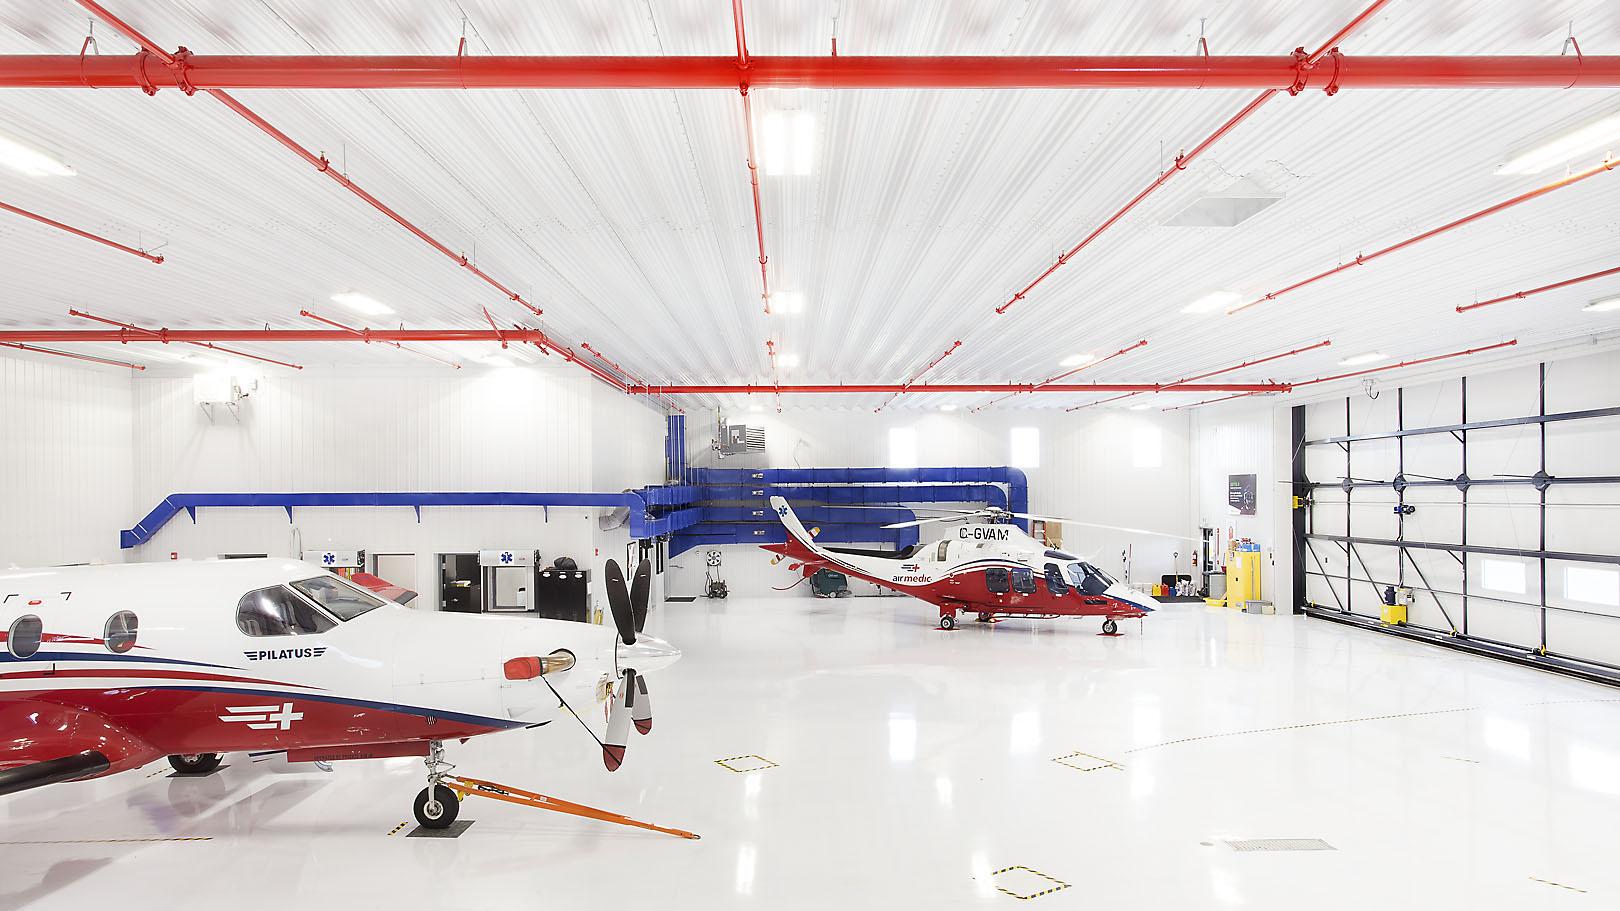 photographe-architecture-industrielle-honco-airmedic